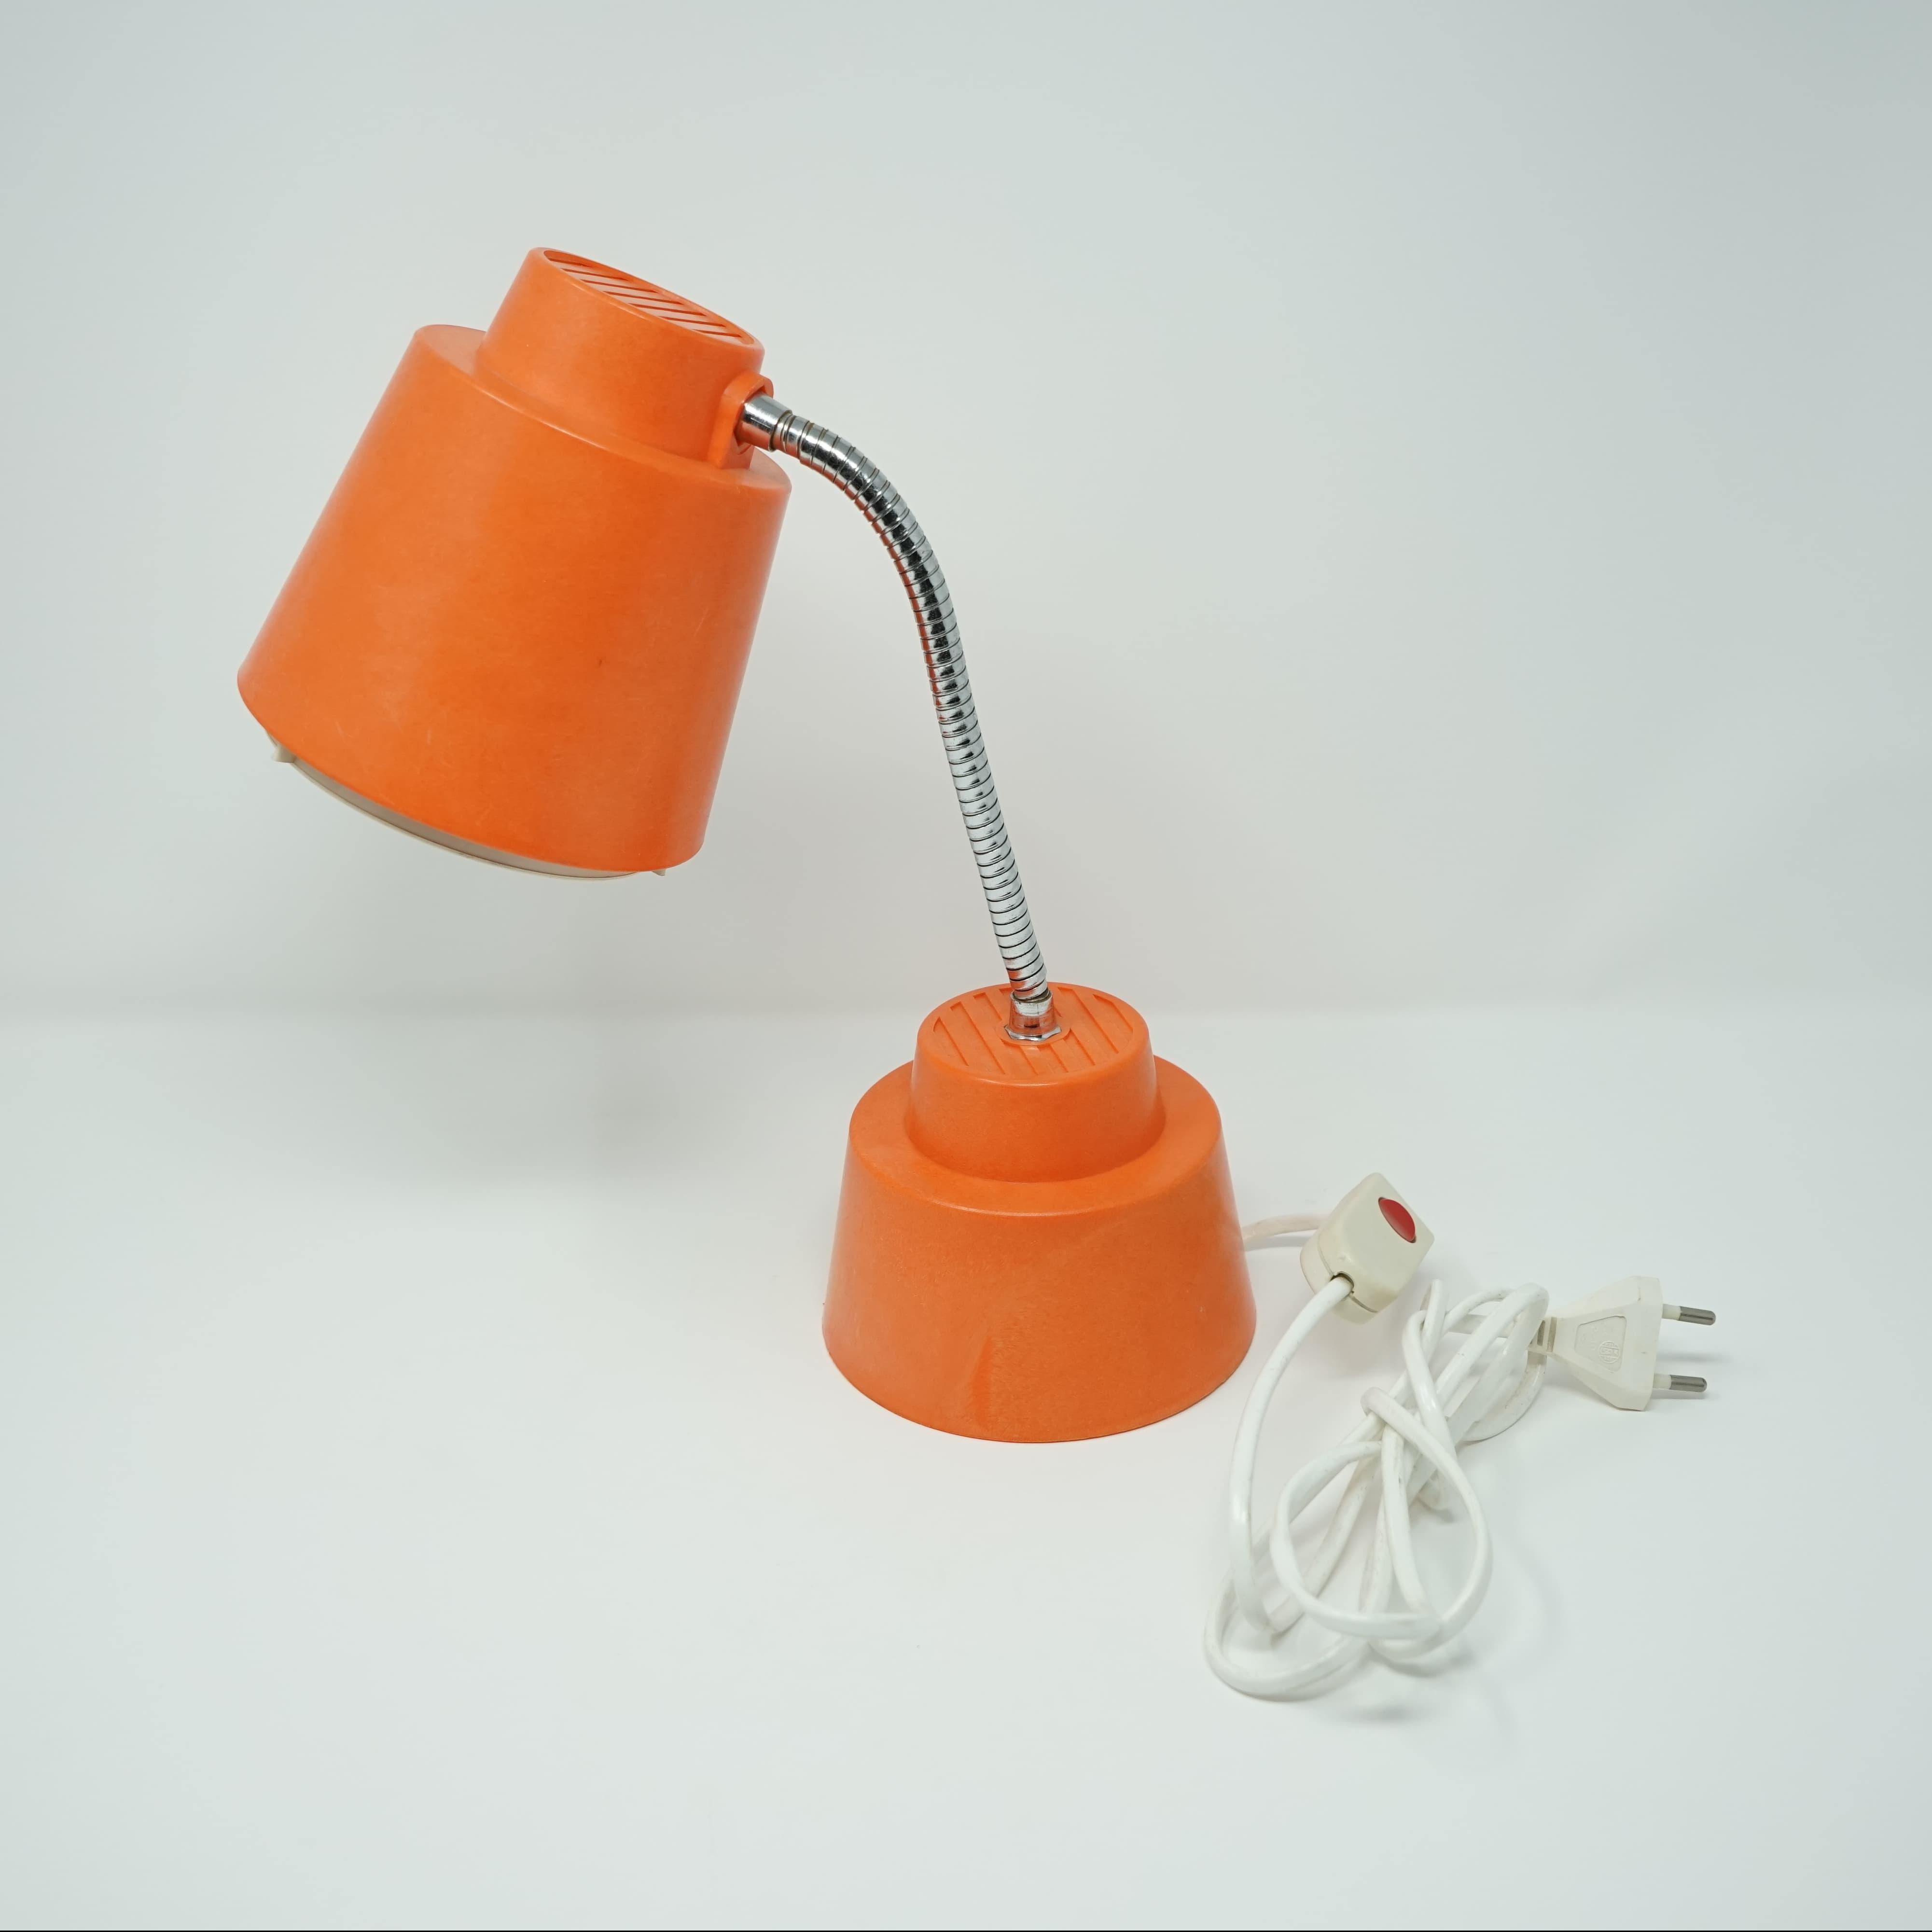 Lampe Armélec France Orange